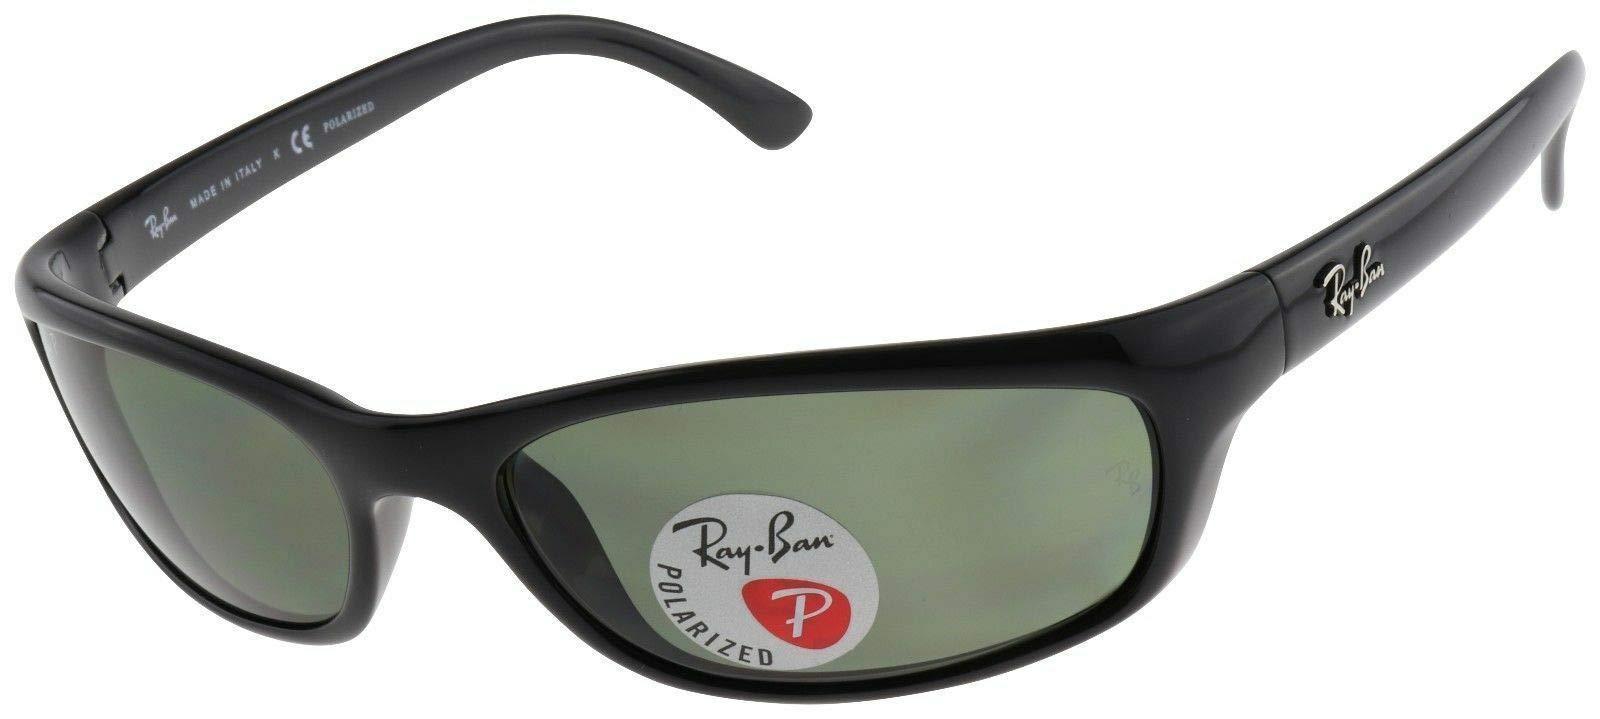 RAY-BAN RB4115 Rectangular Sunglasses, Black/Polarized Green, 57 mm by RAY-BAN